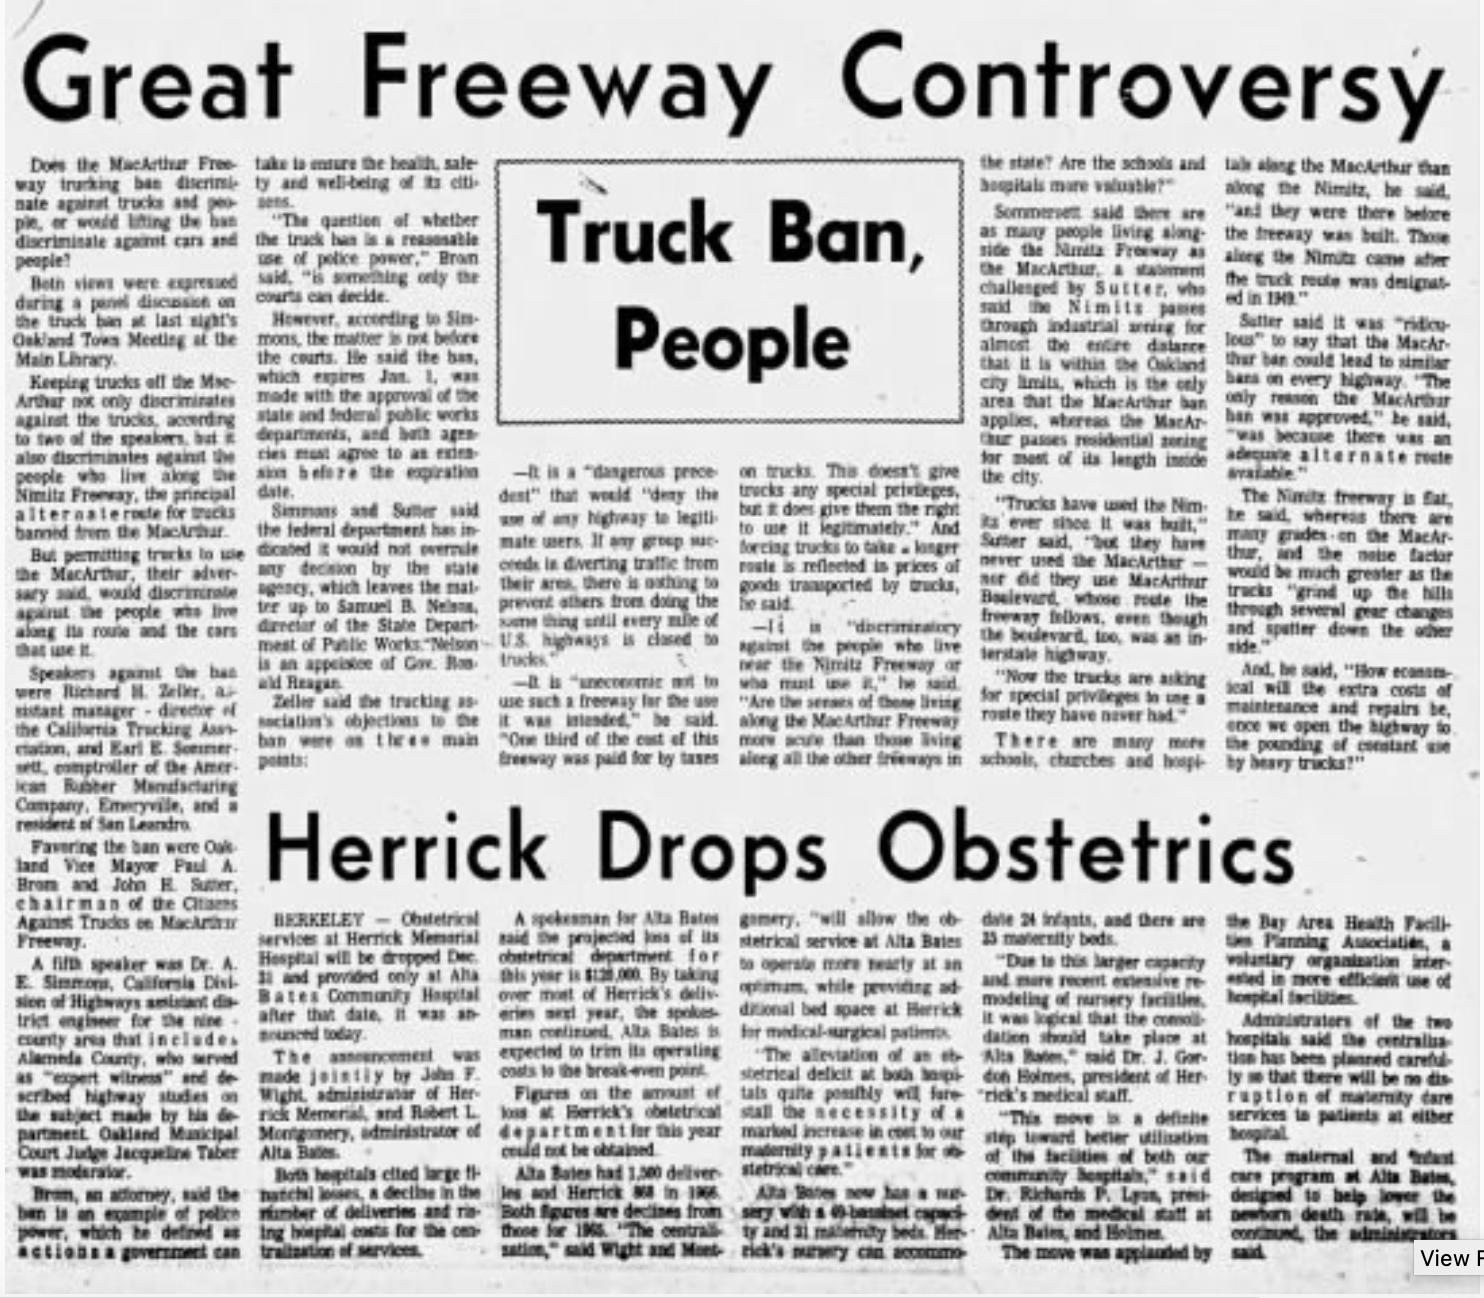 Oakland Tribune article from November 14, 1967